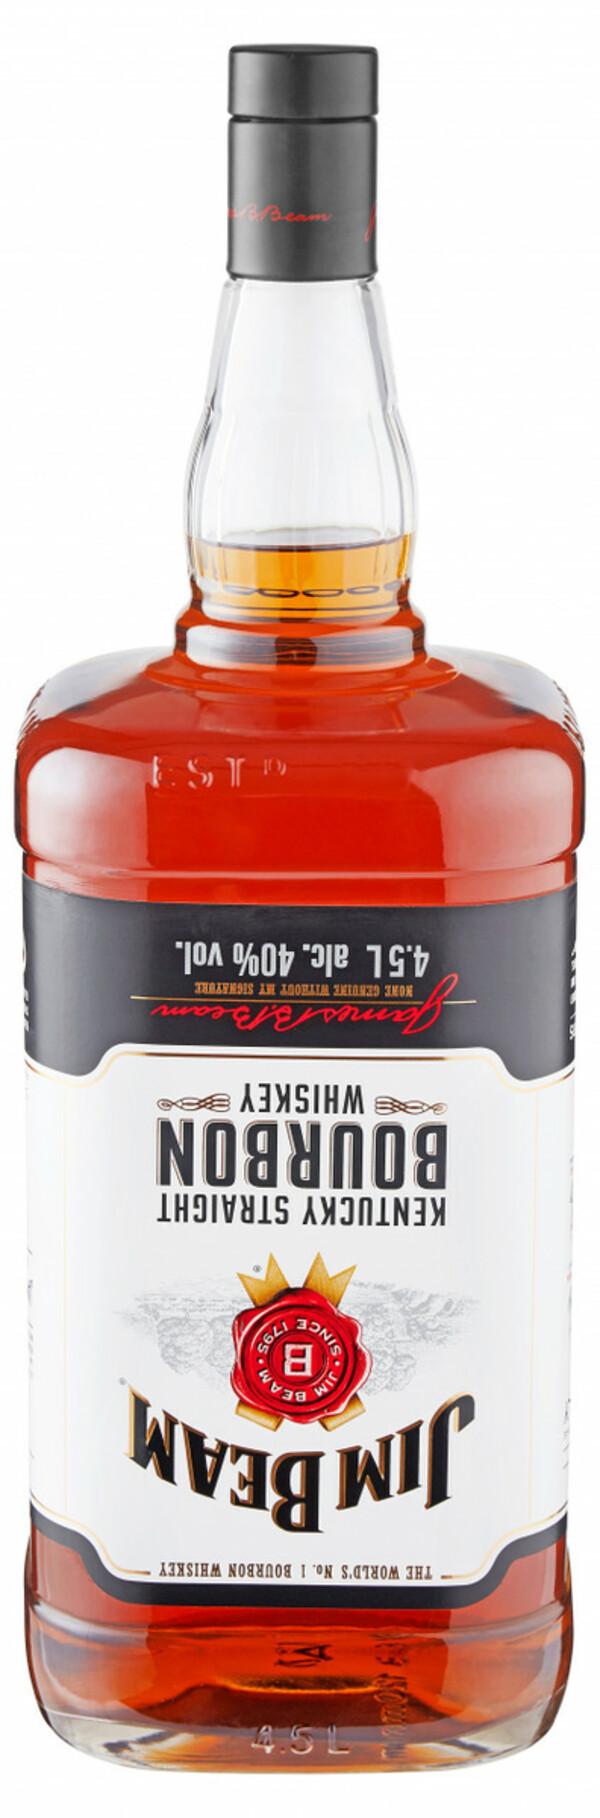 Jim Beam Bourbon Whiskey - 4,5 L